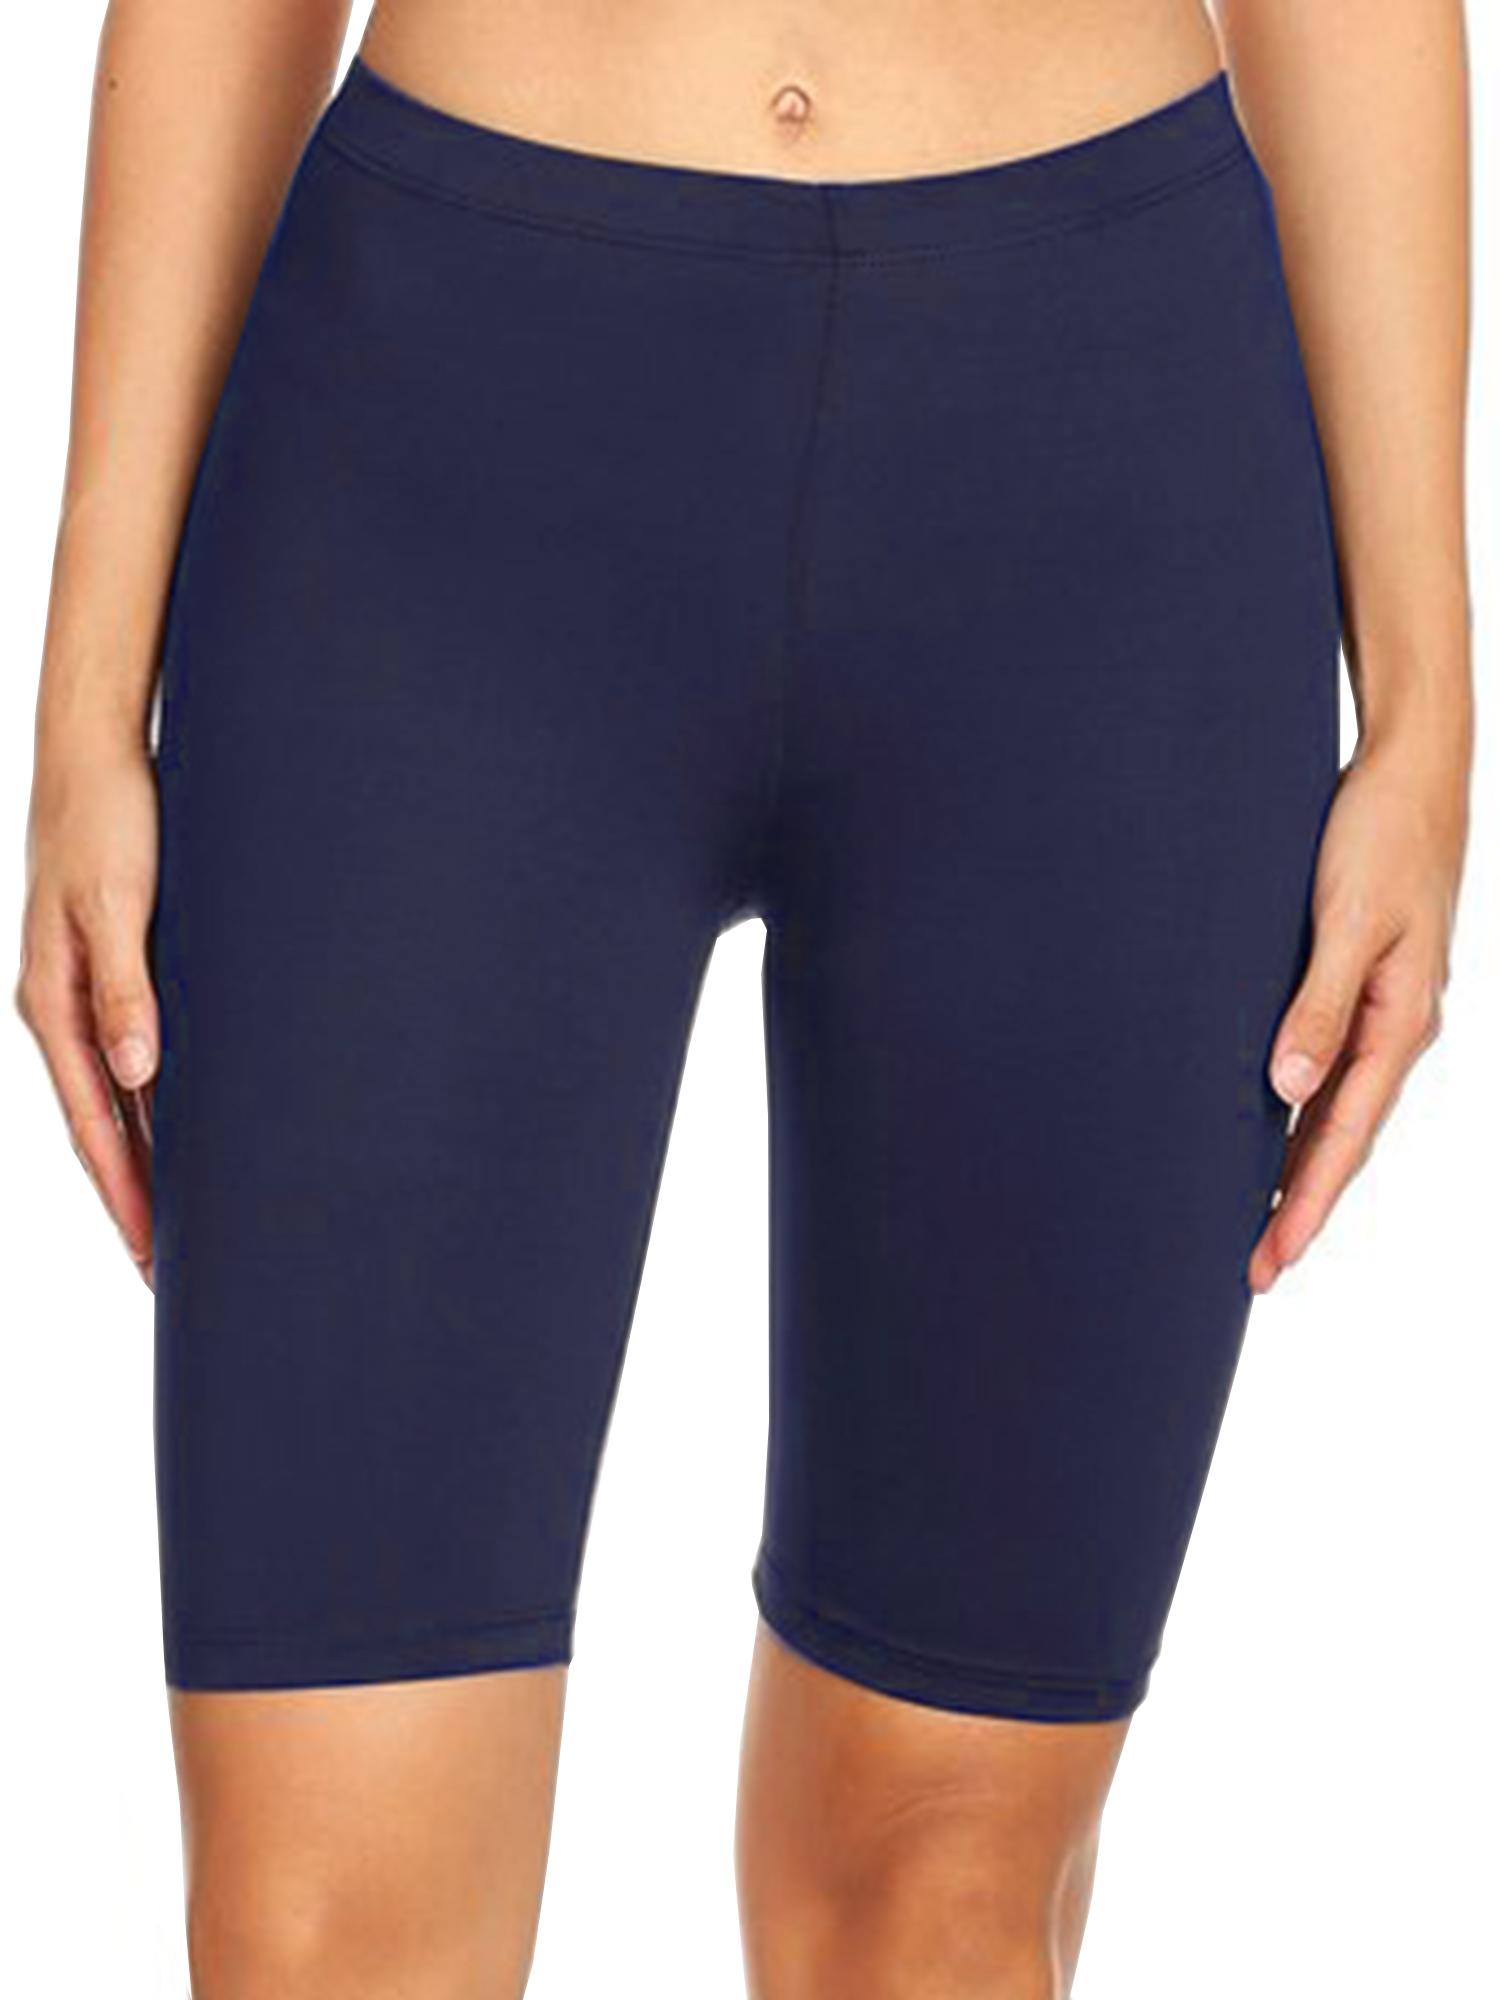 Imagenation Plain Soild Biker Shorts, Large, Navy